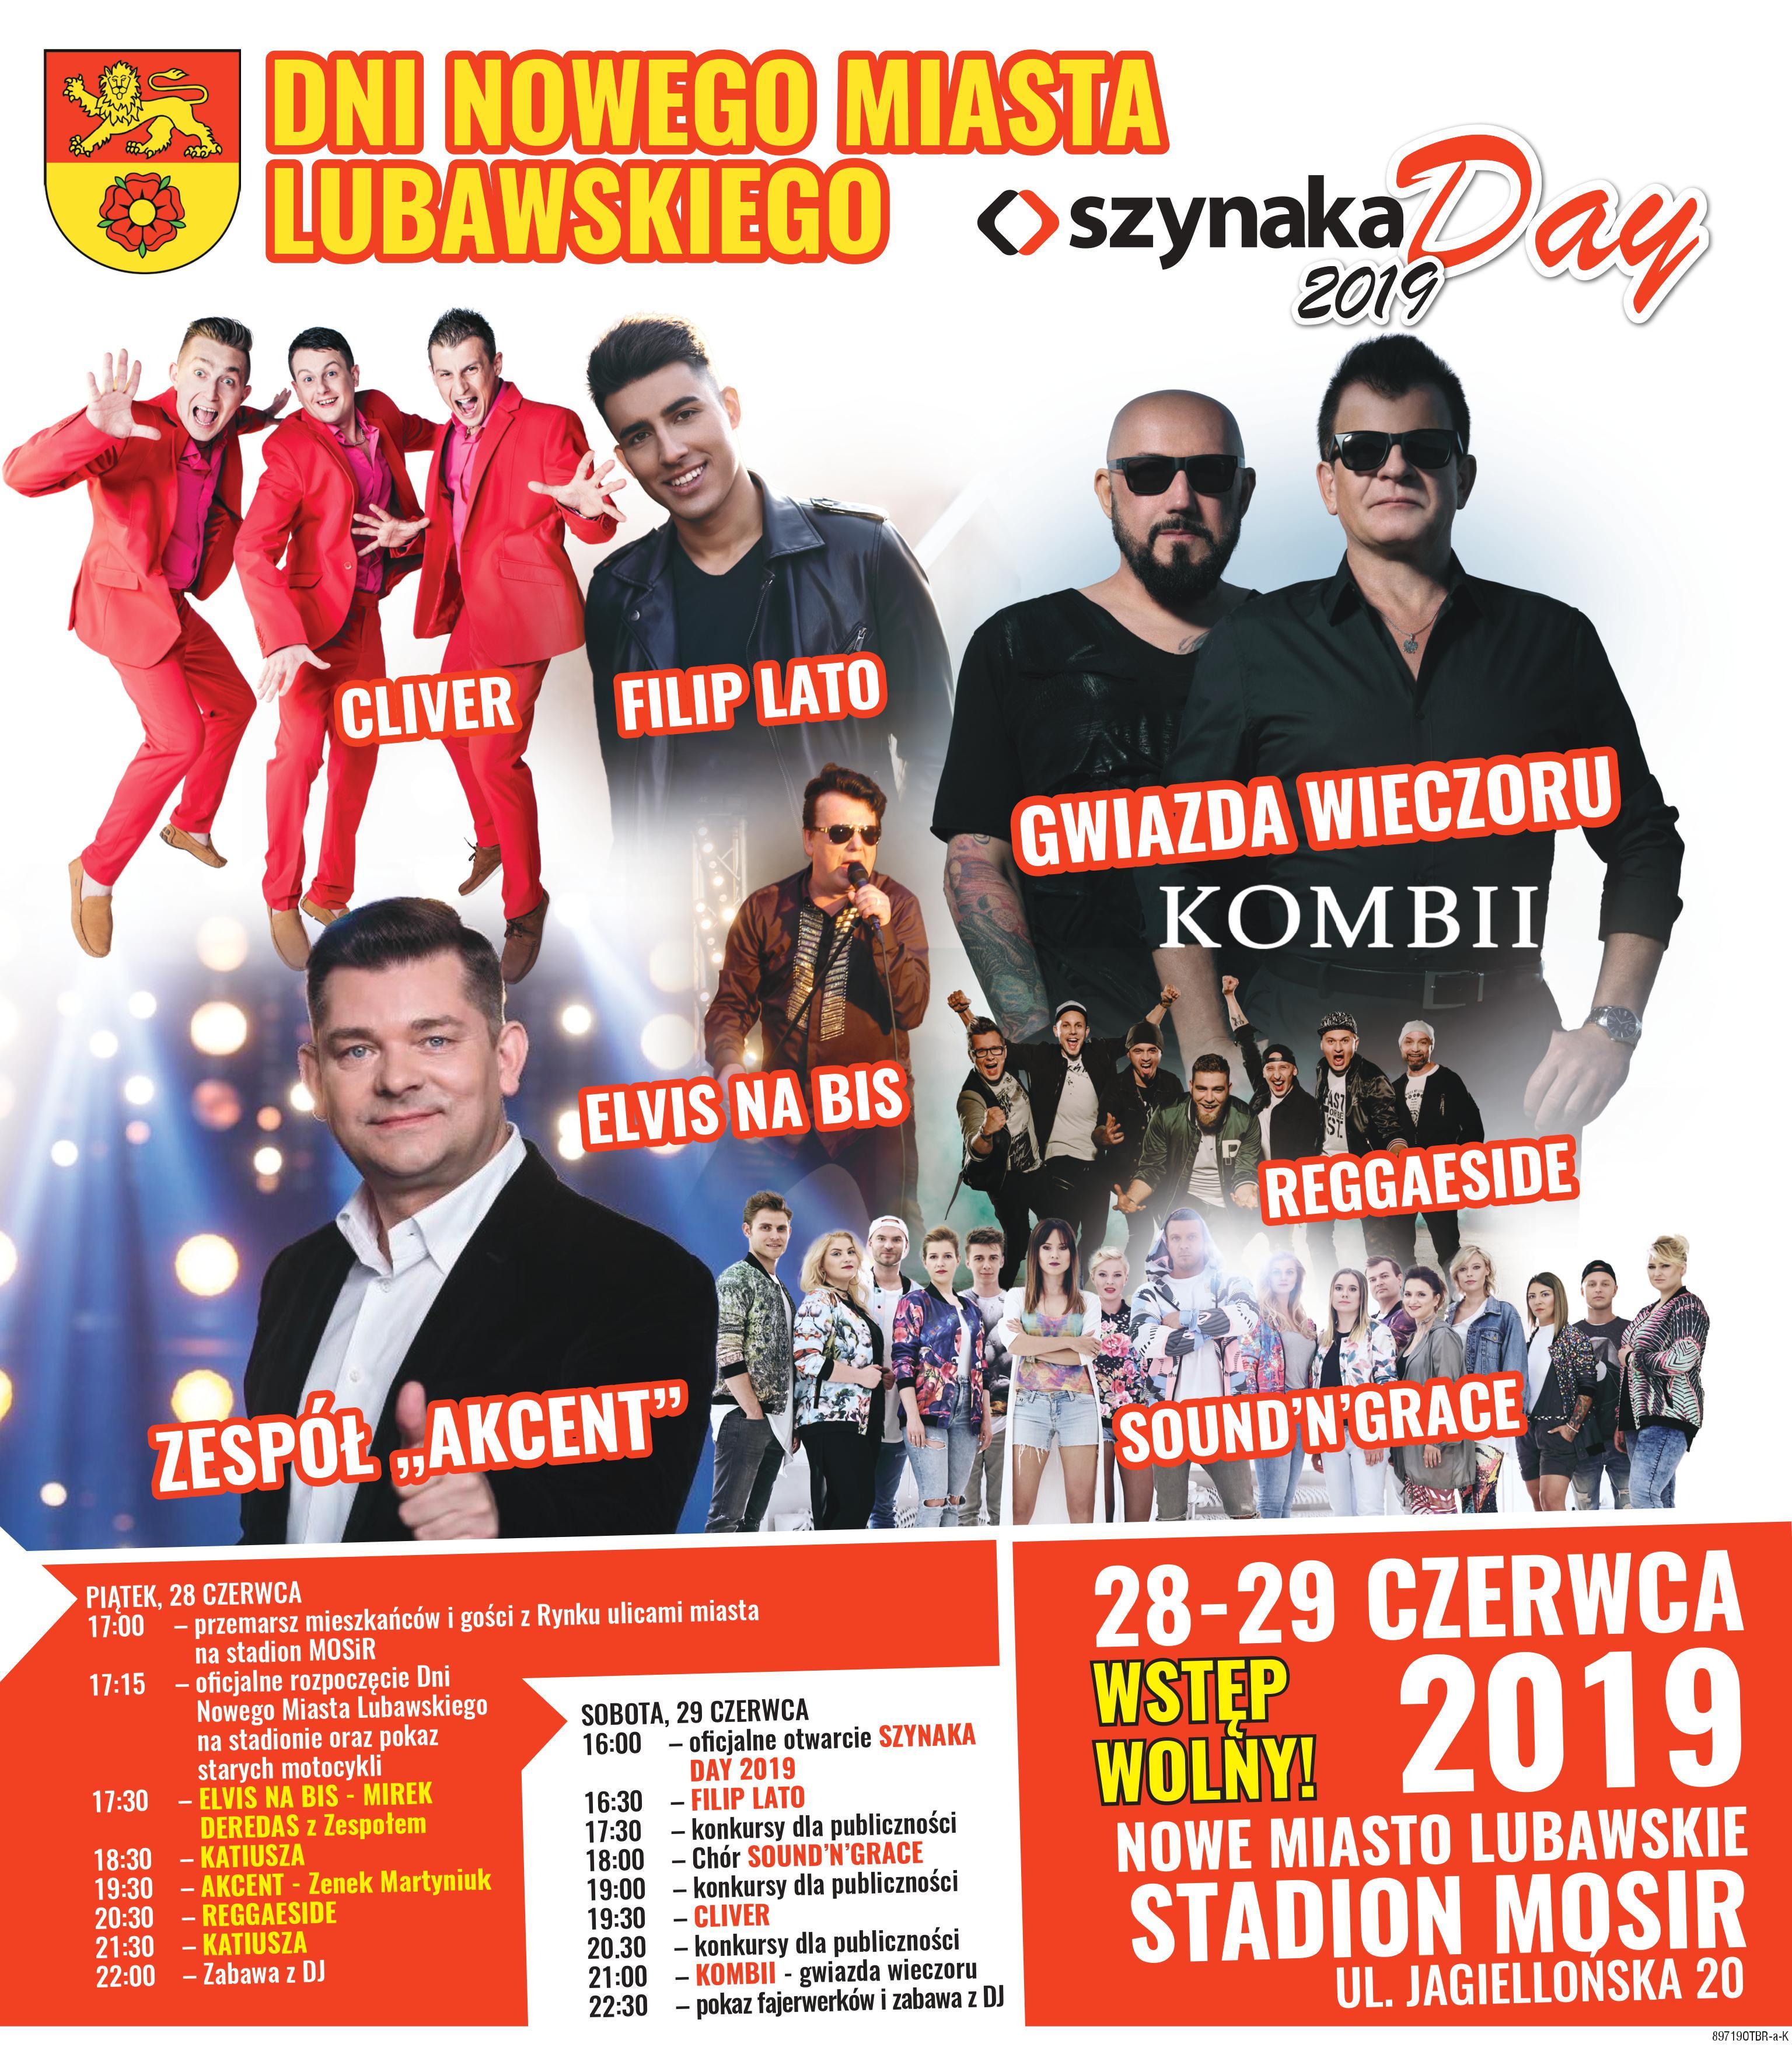 Polski Elvis Presley, Polski Elvis - Mirek Deredas